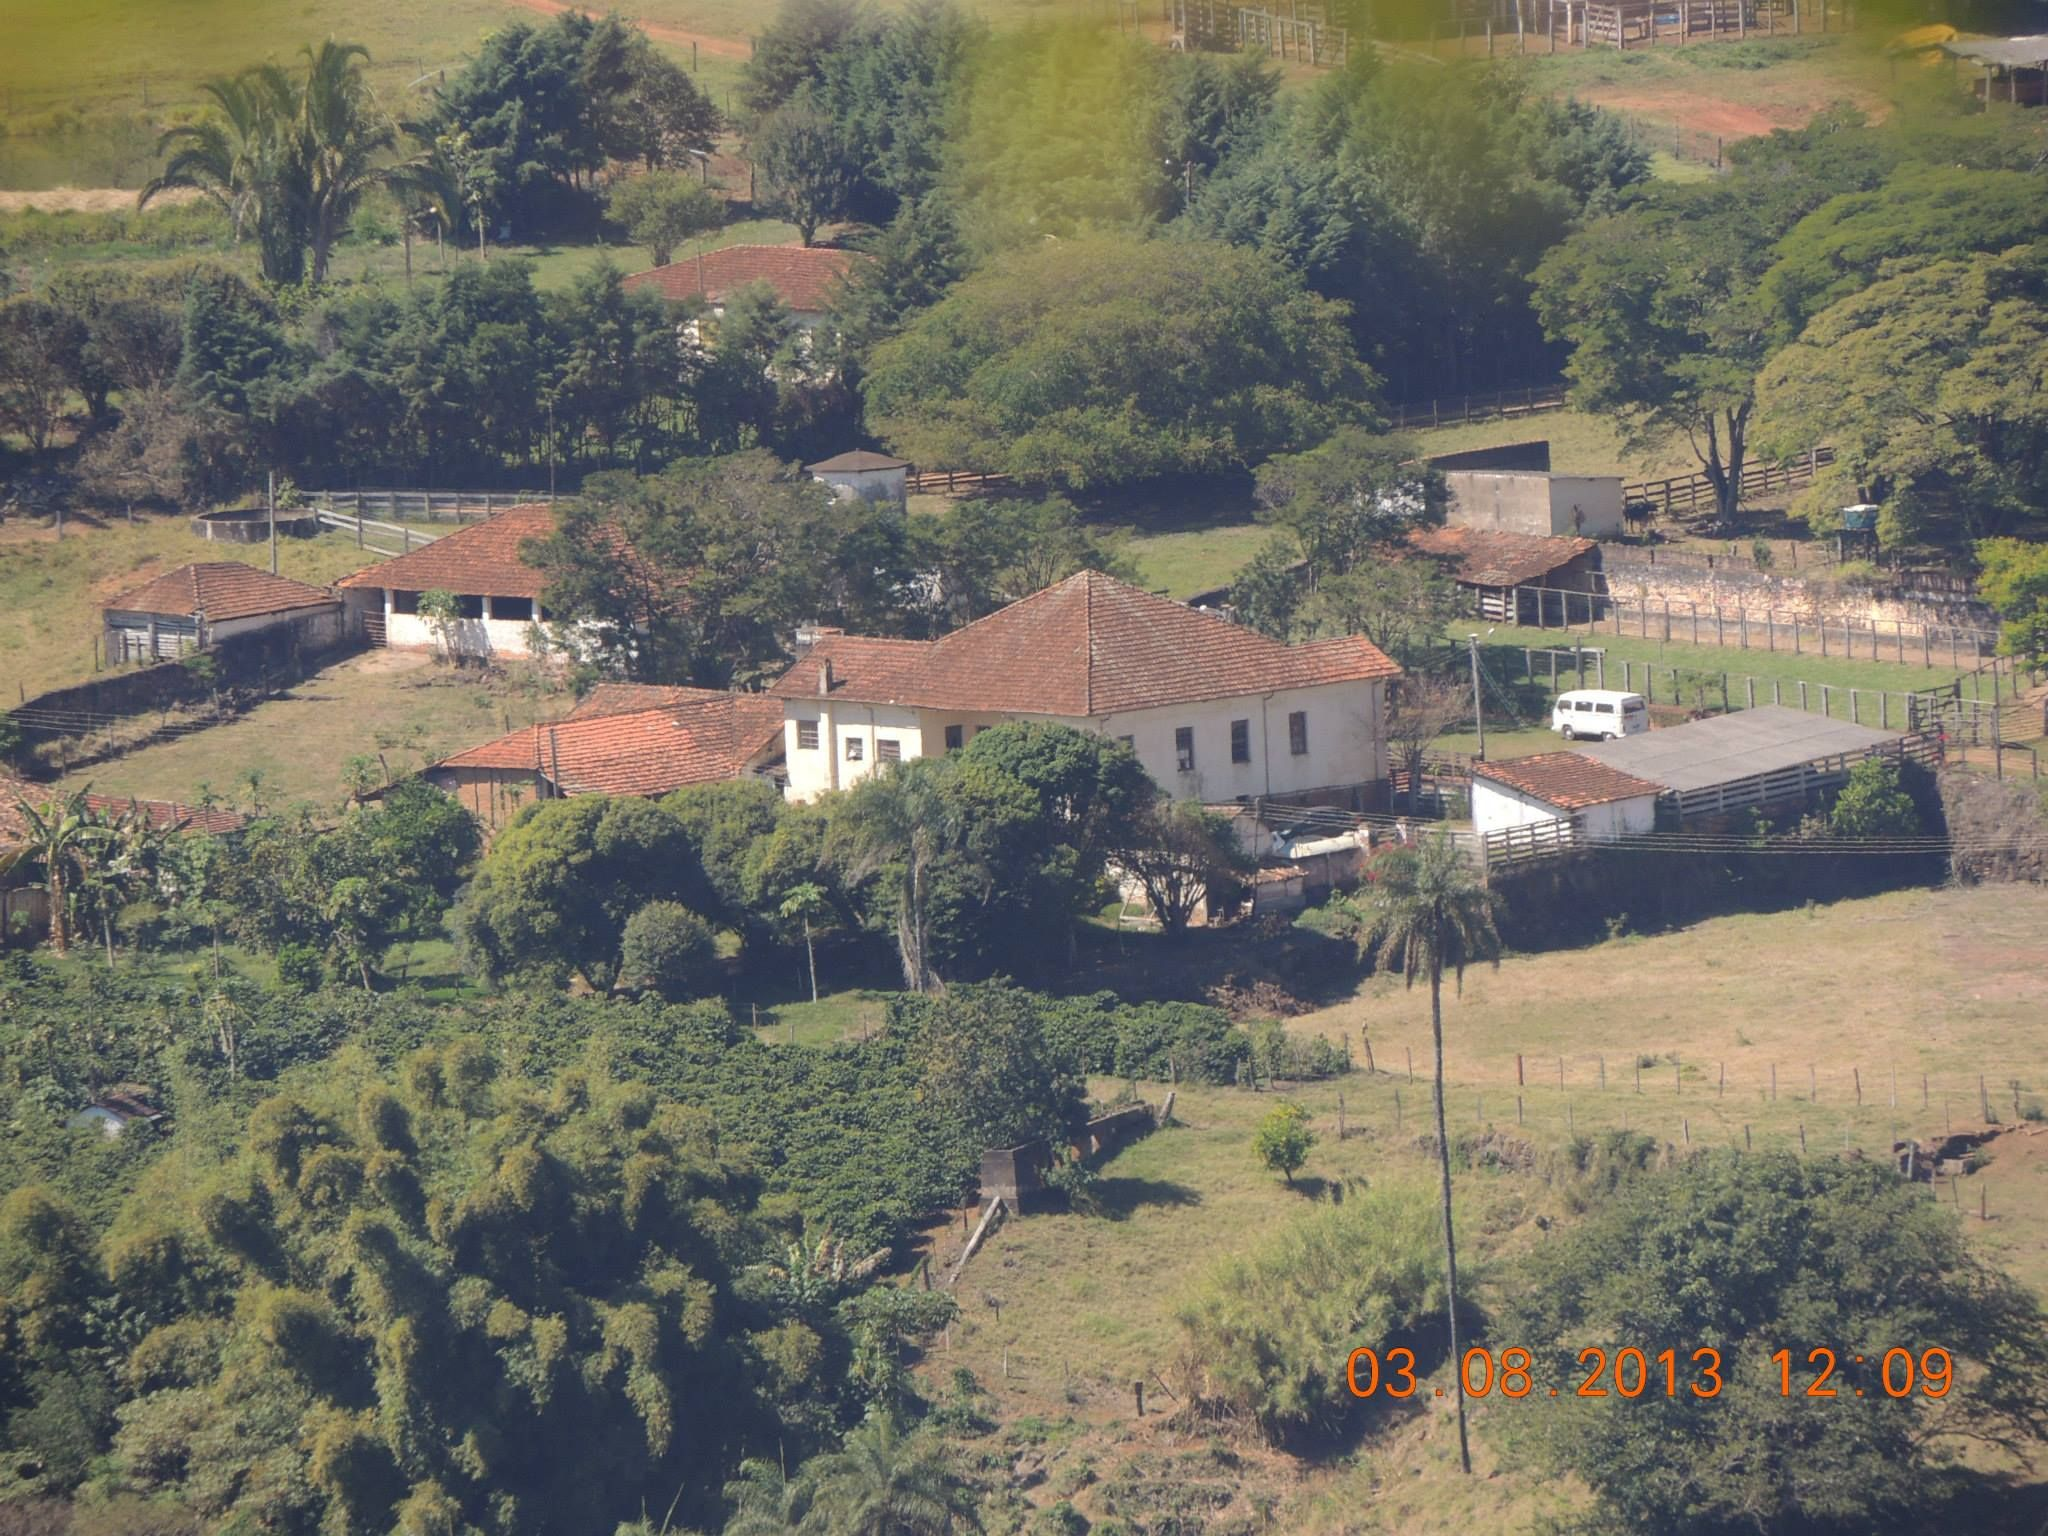 Fazenda Taquaral 2 Casas De Fazenda Casa De Fazenda Fazendas